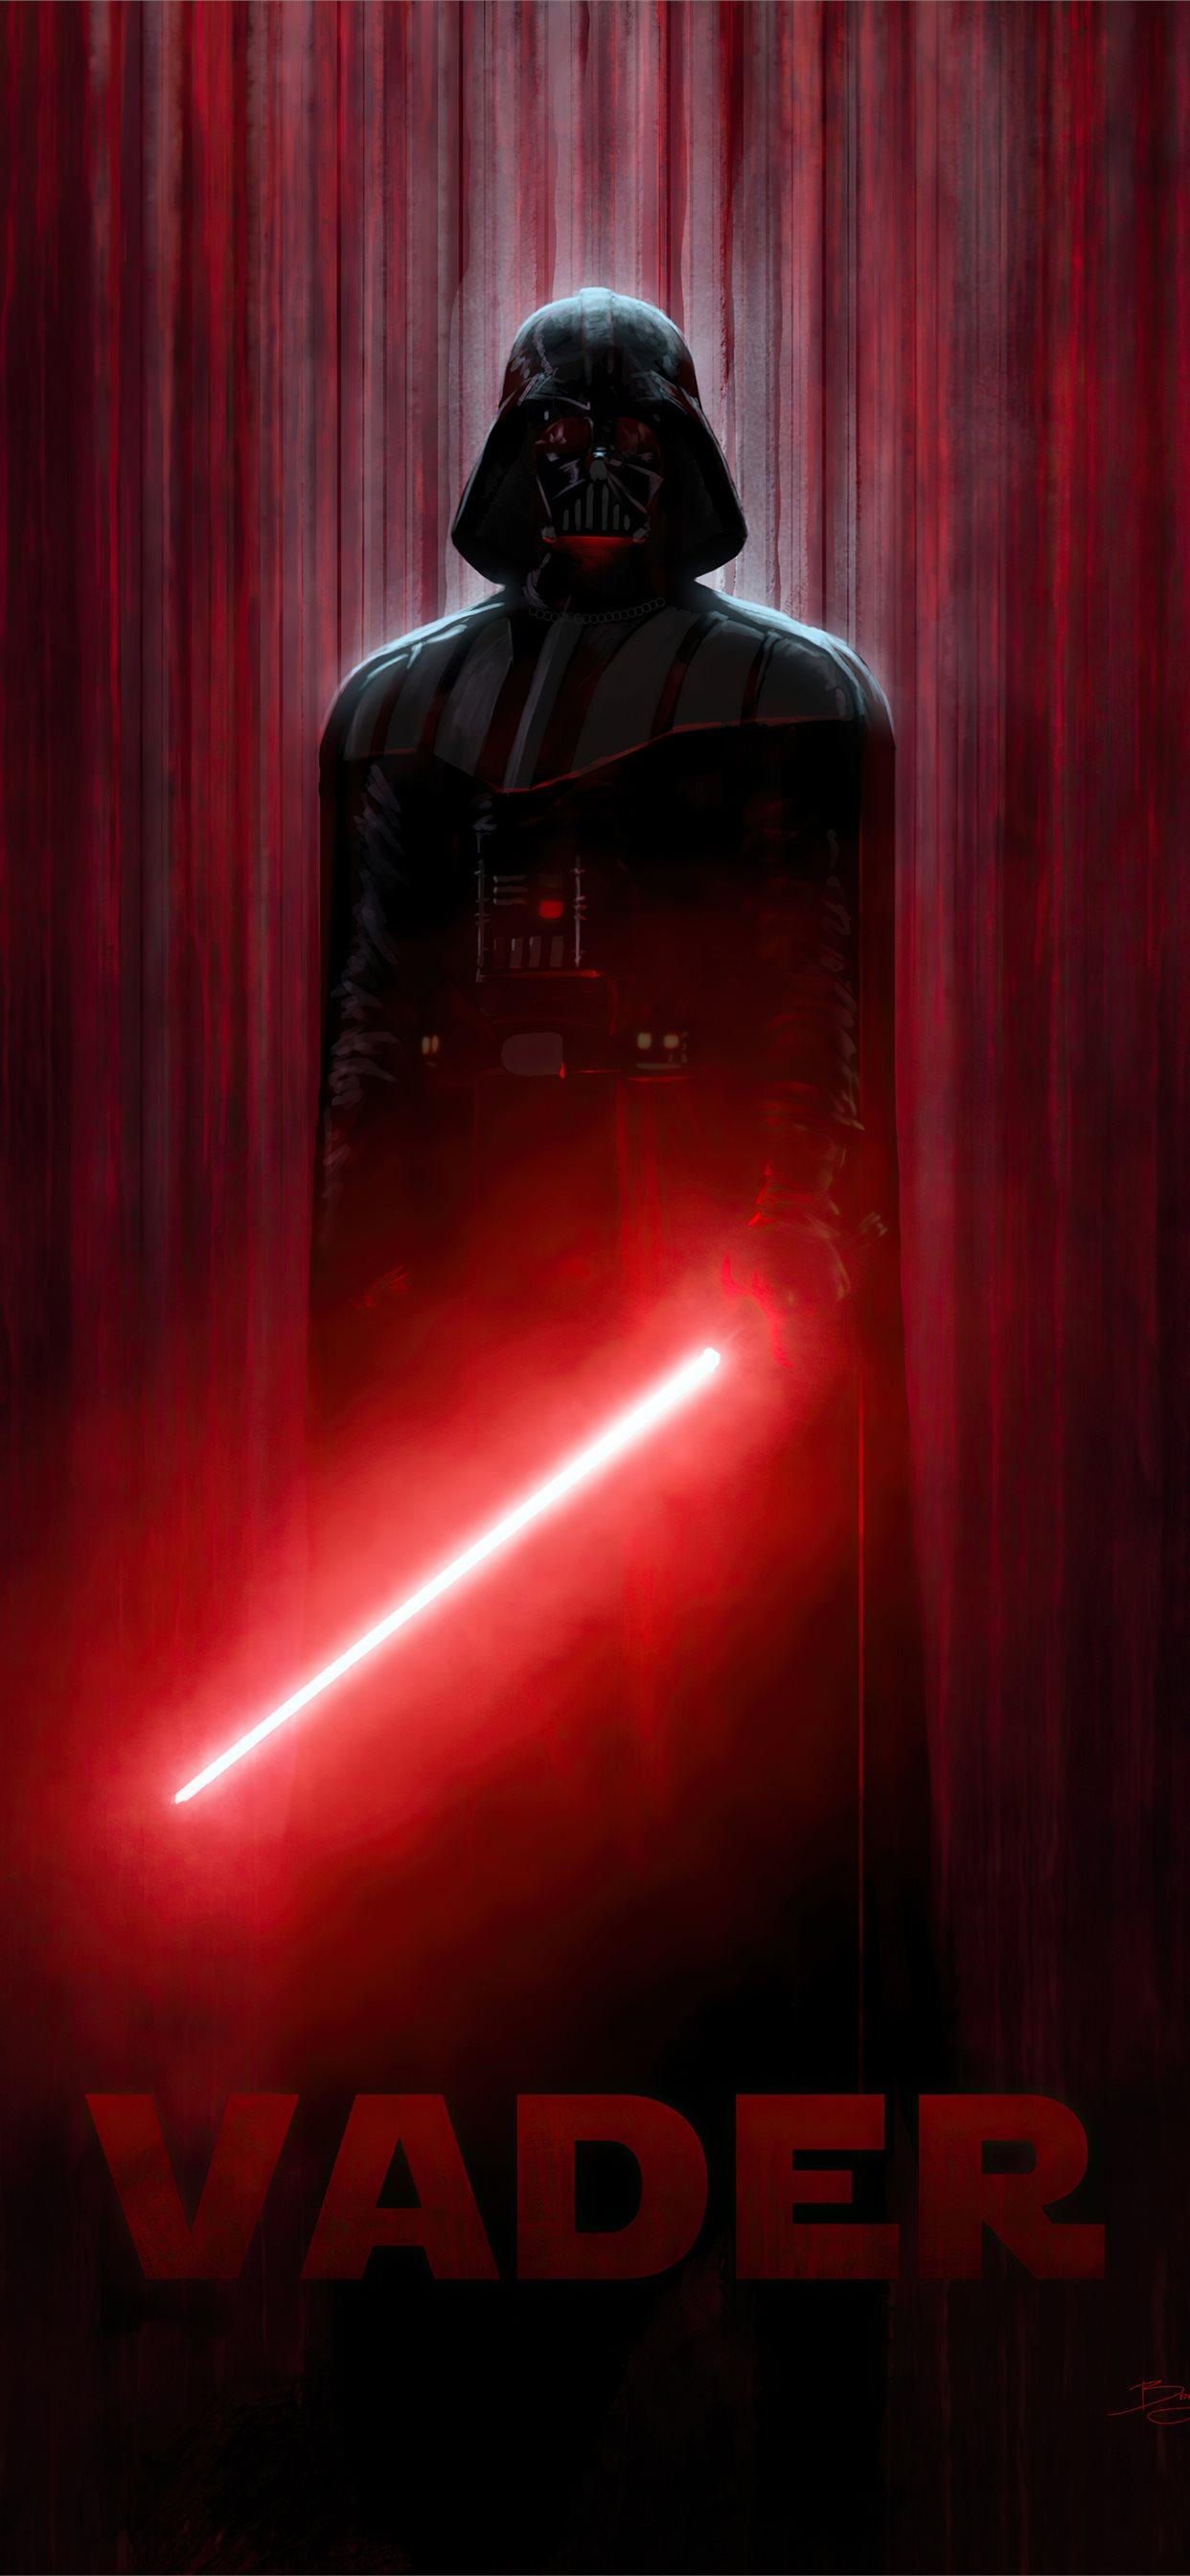 Darth Vader 4k Art Iphone 11 Wallpapers Free Download